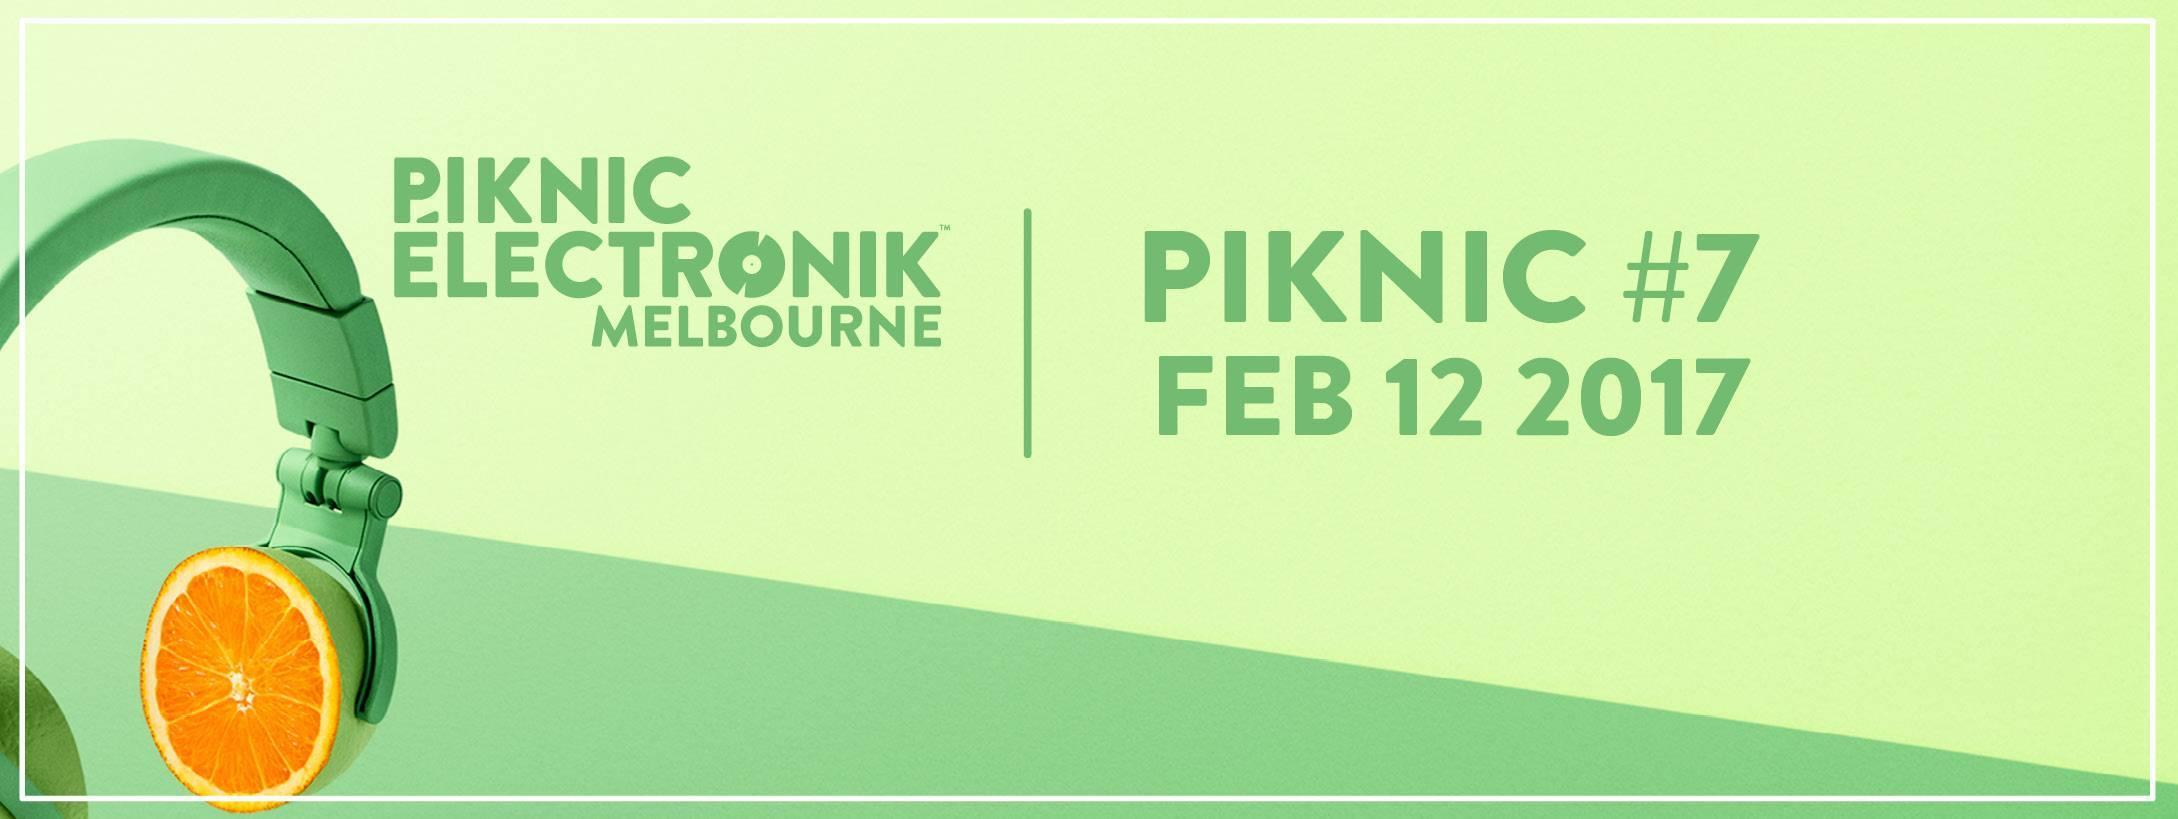 Piknic Electronik Melbourne